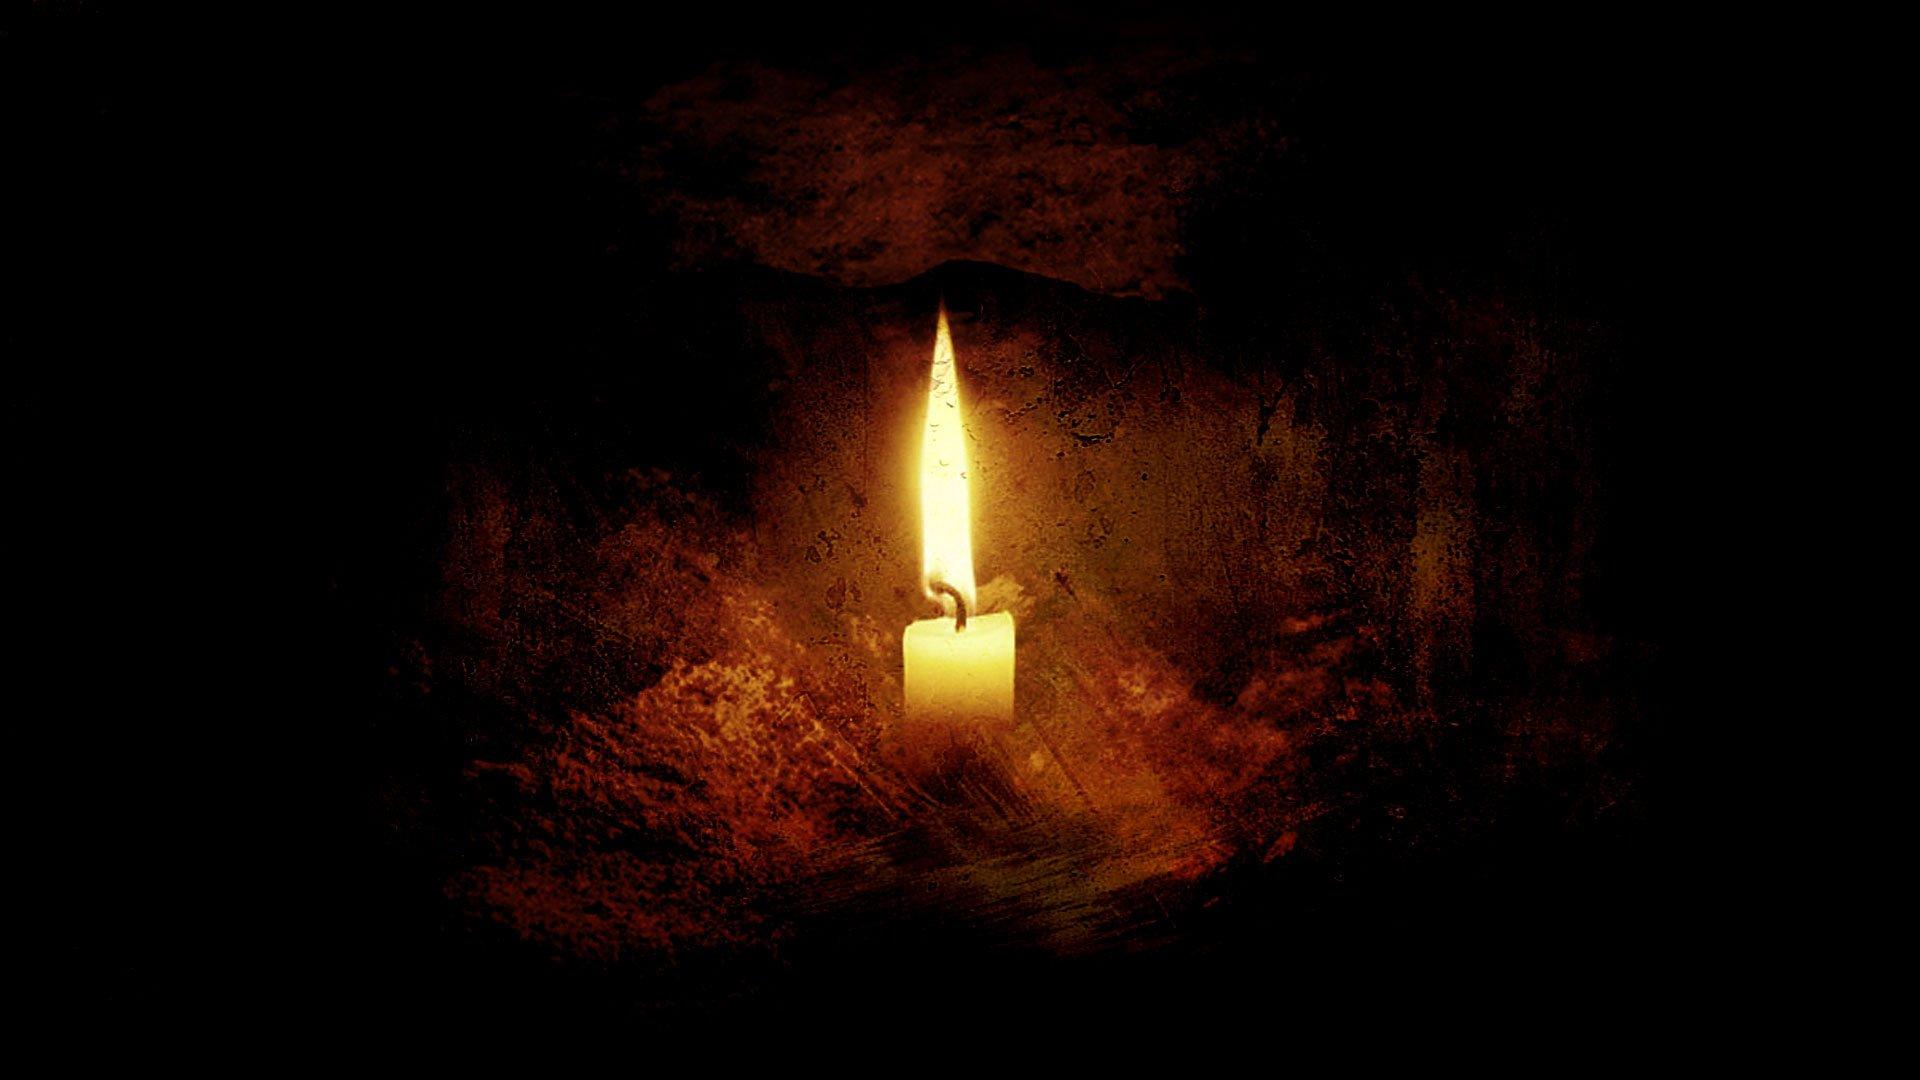 a single lit candle set on a rocky ledge